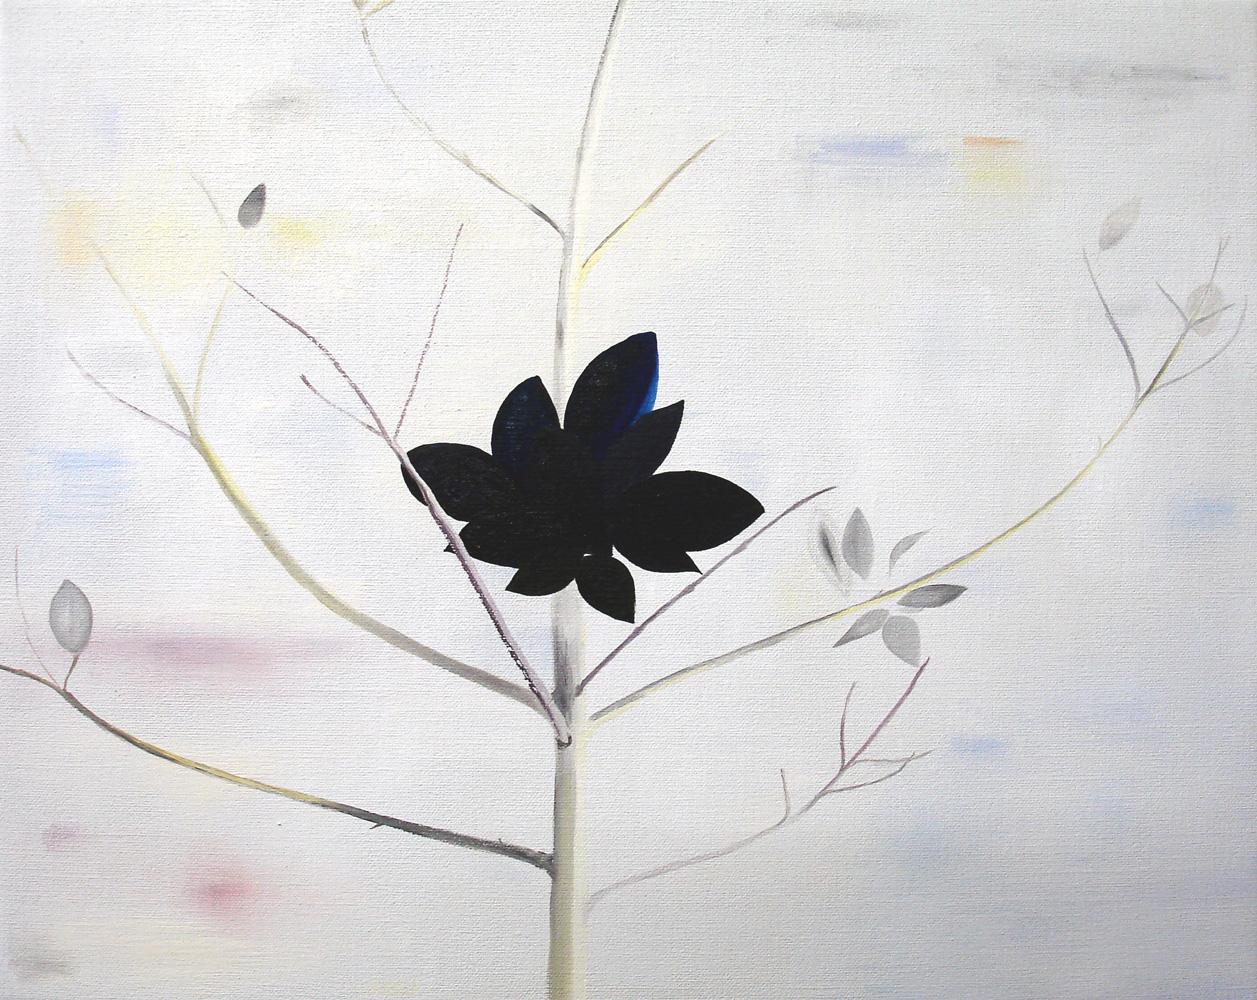 Bunch    2008, oil on canvas, 40 x 50cm